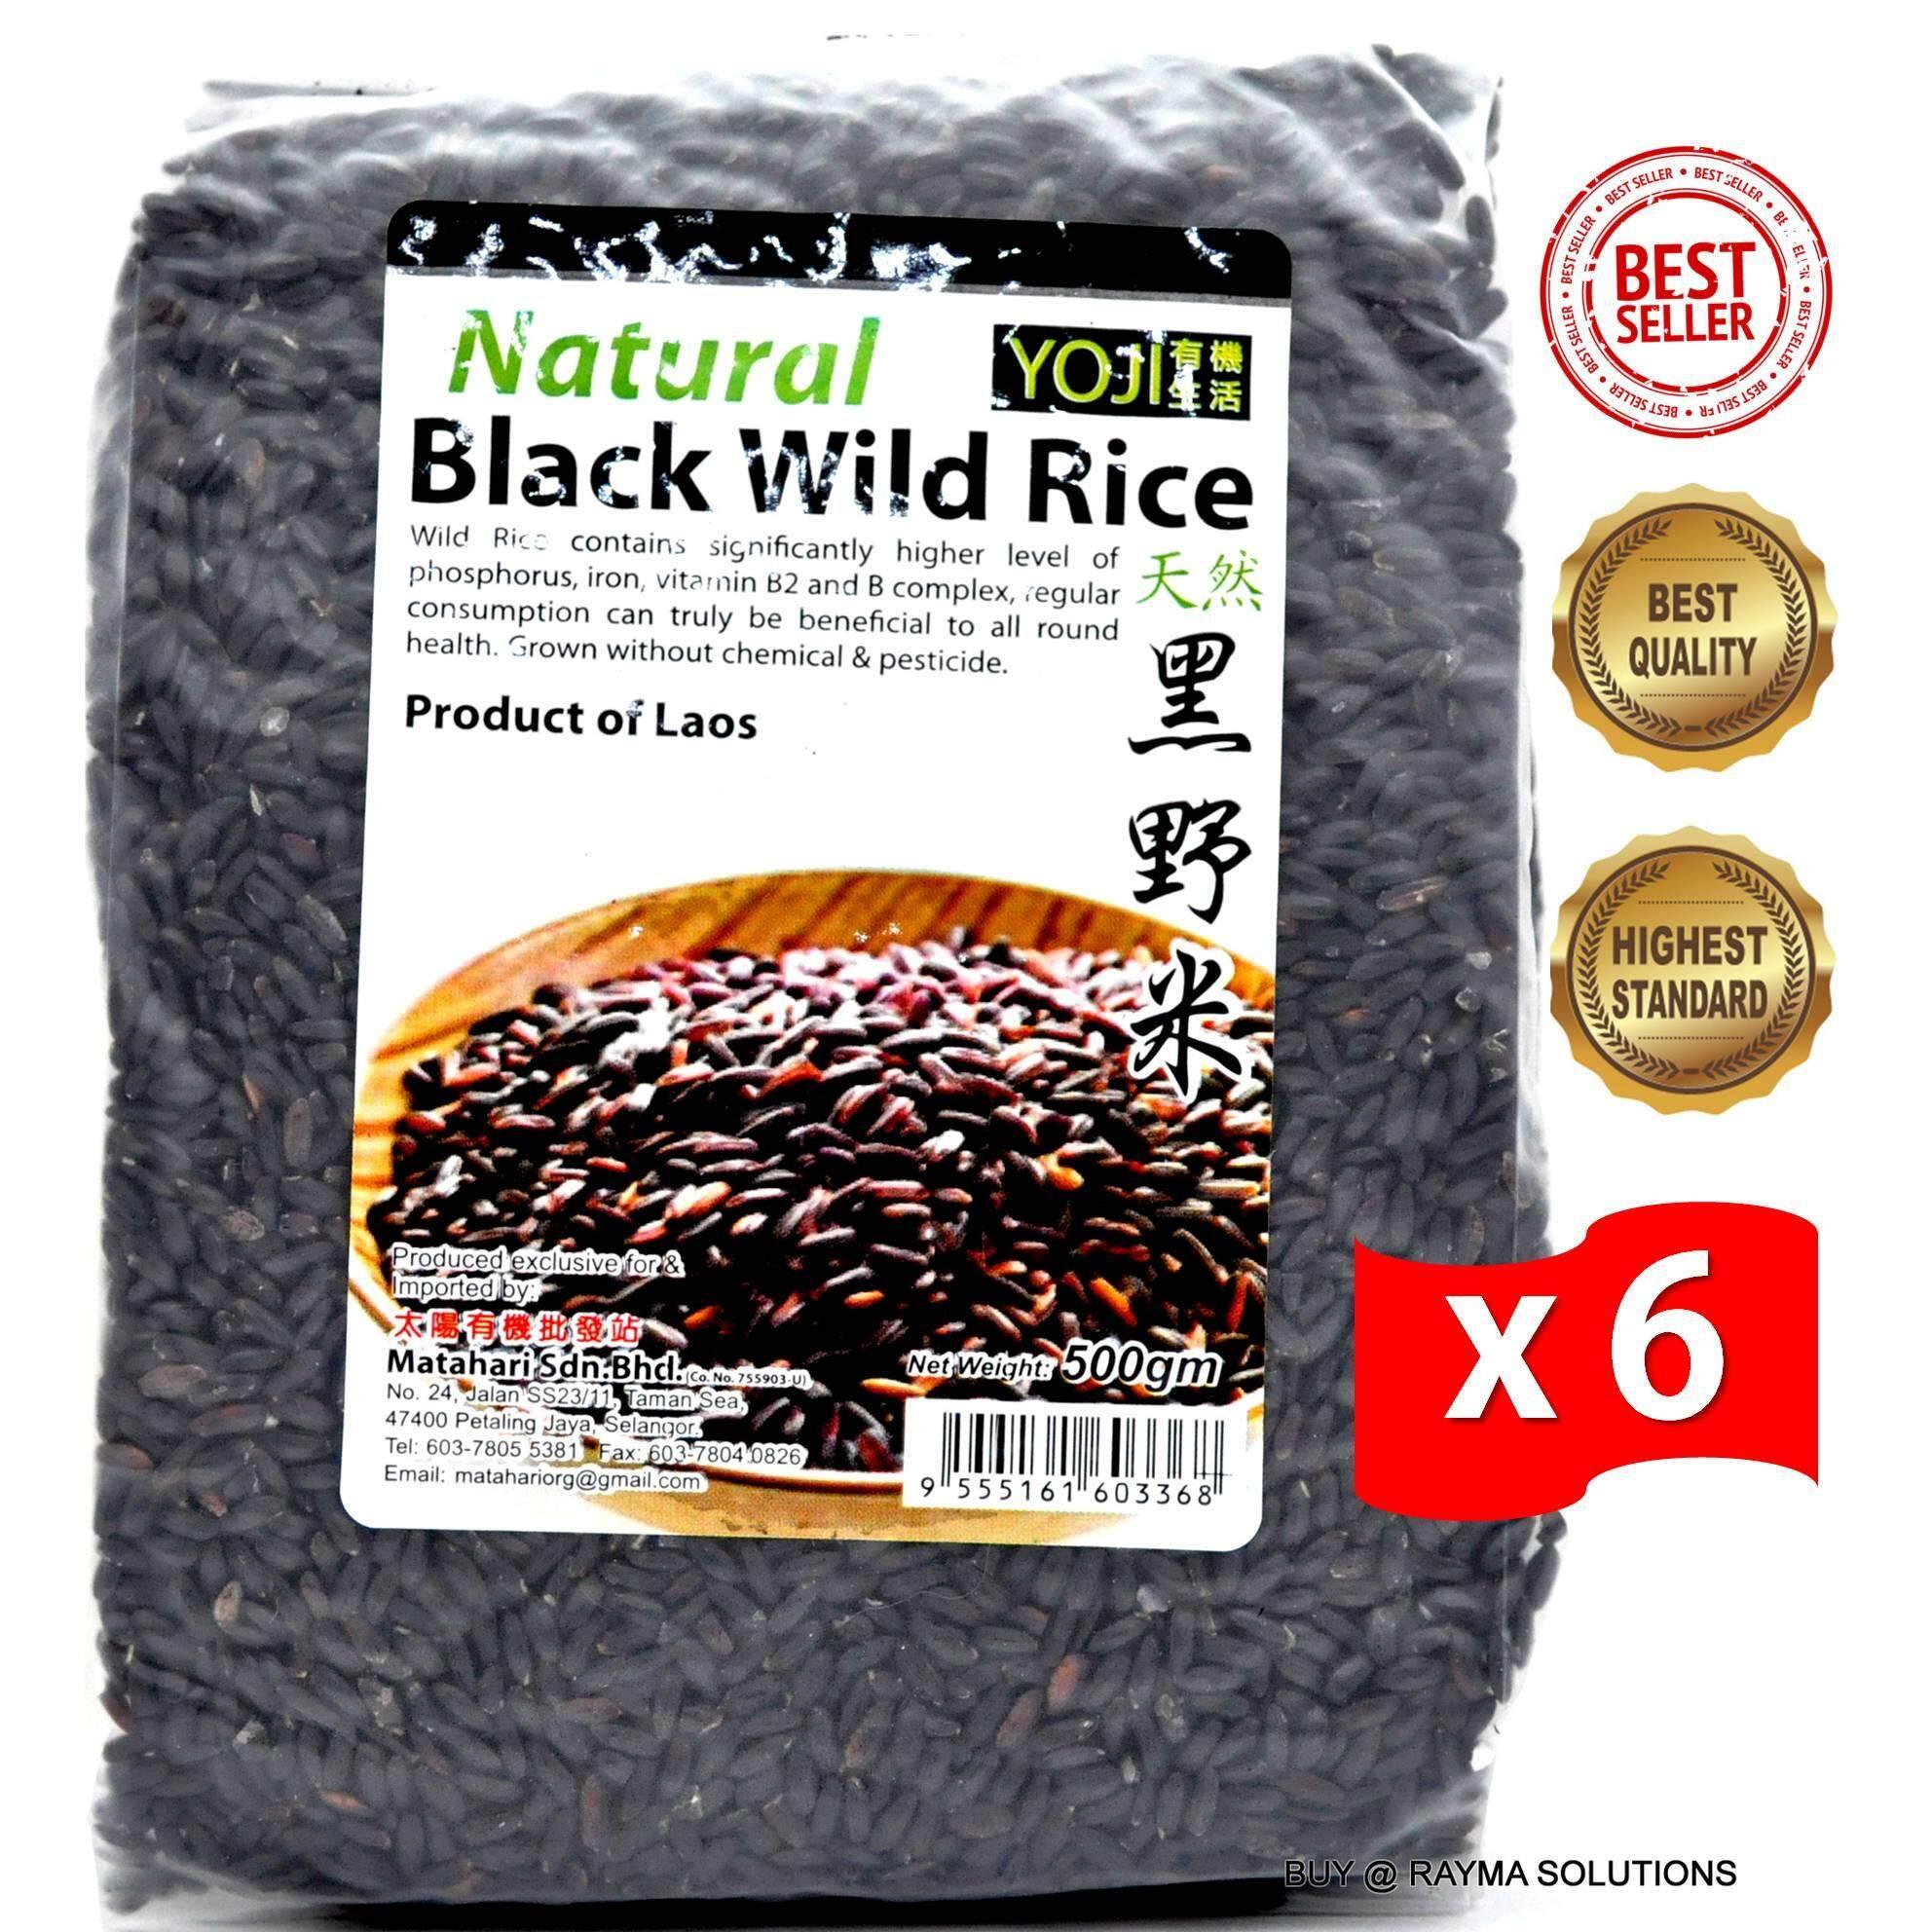 [Best Deal] MH FOOD Natural Black Wild Rice, Gluten-Free, 500g (6 Packs)